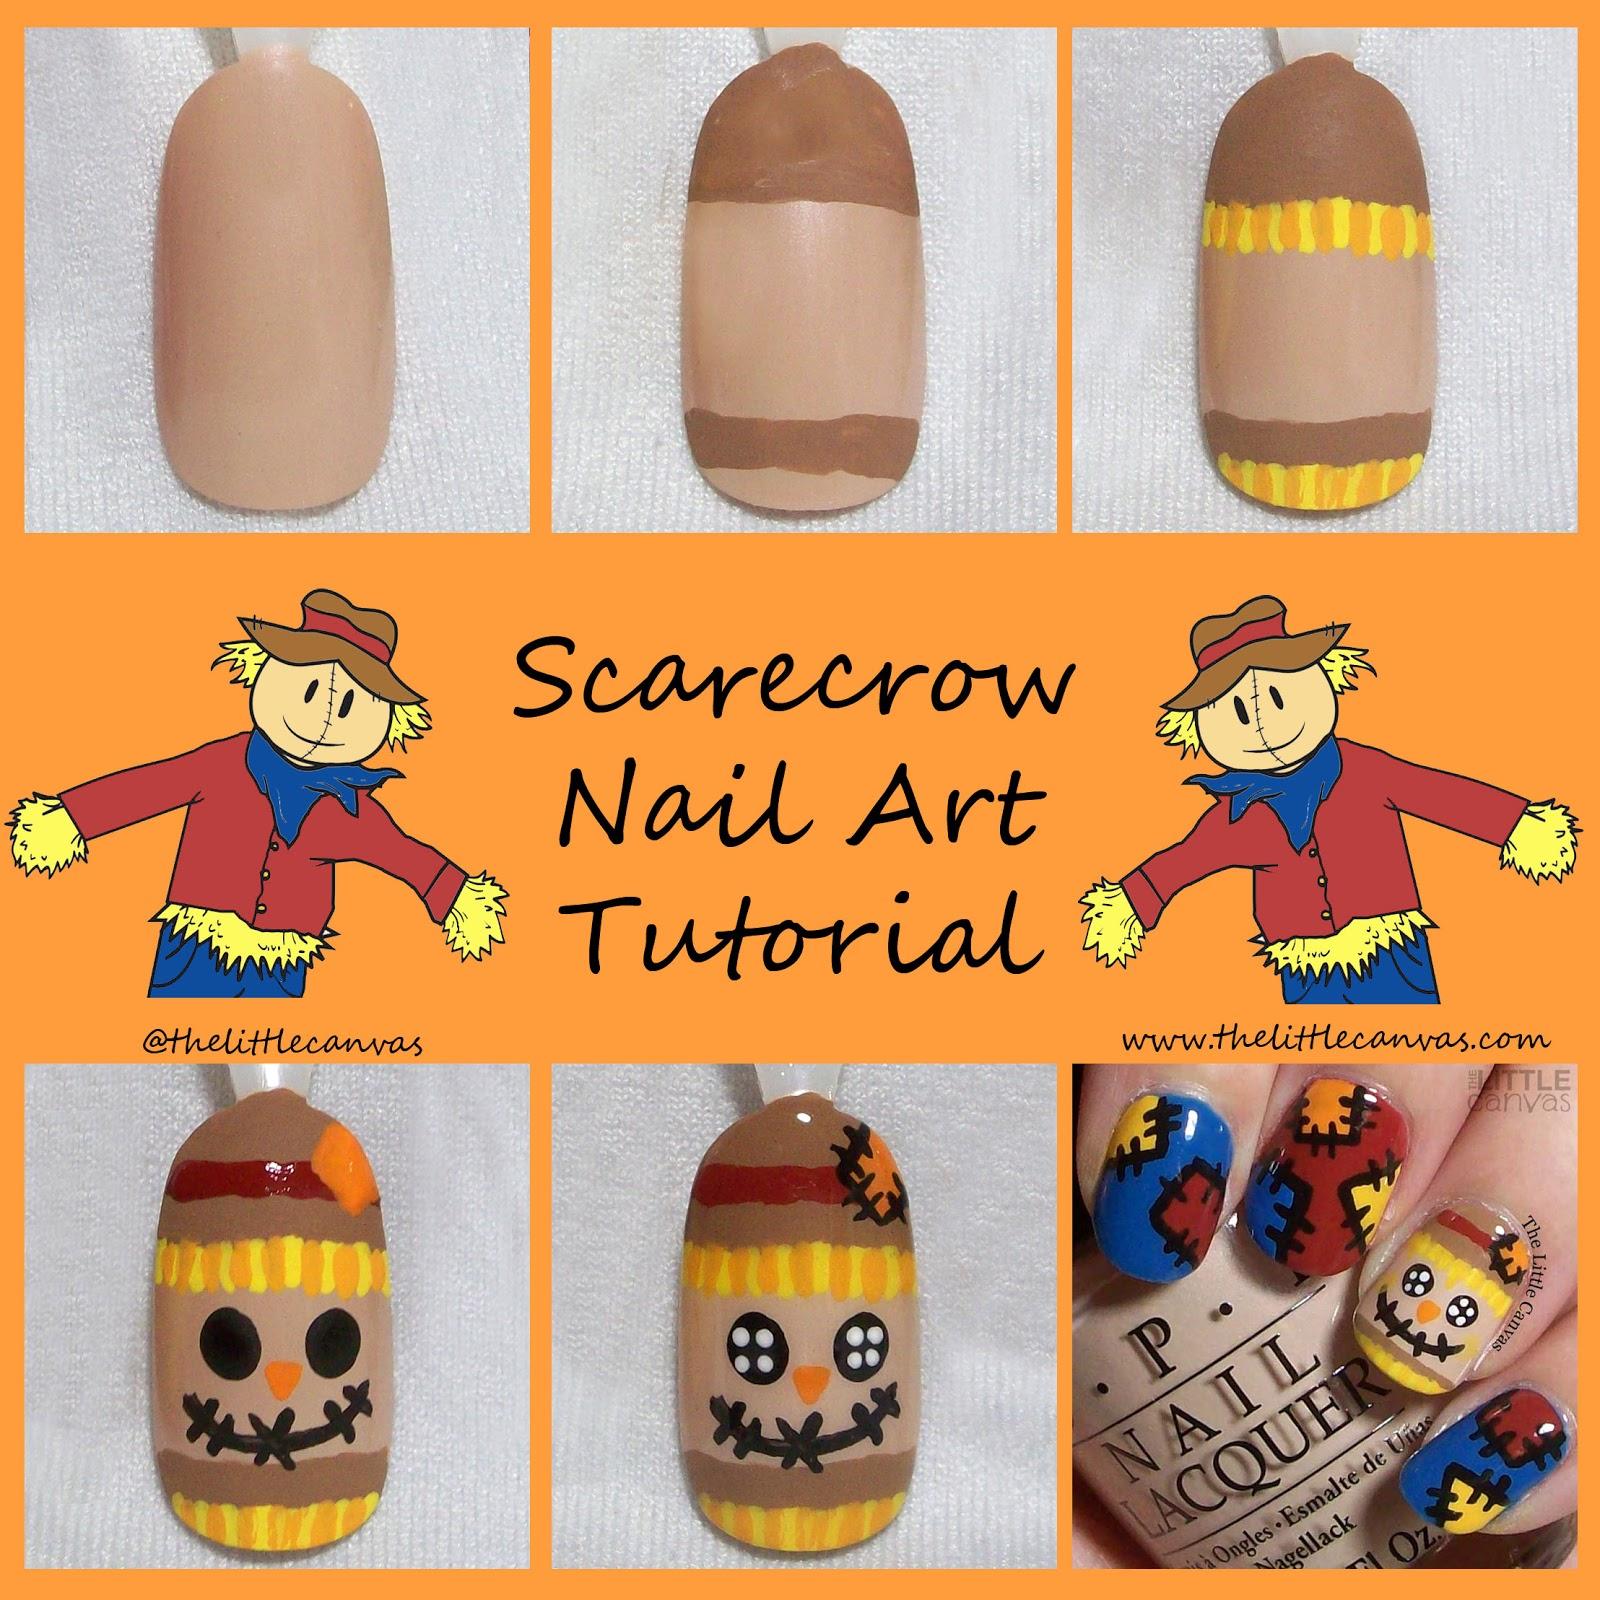 Scarecrow and Scarecrow Patchwork Nail Art Tutorials ...